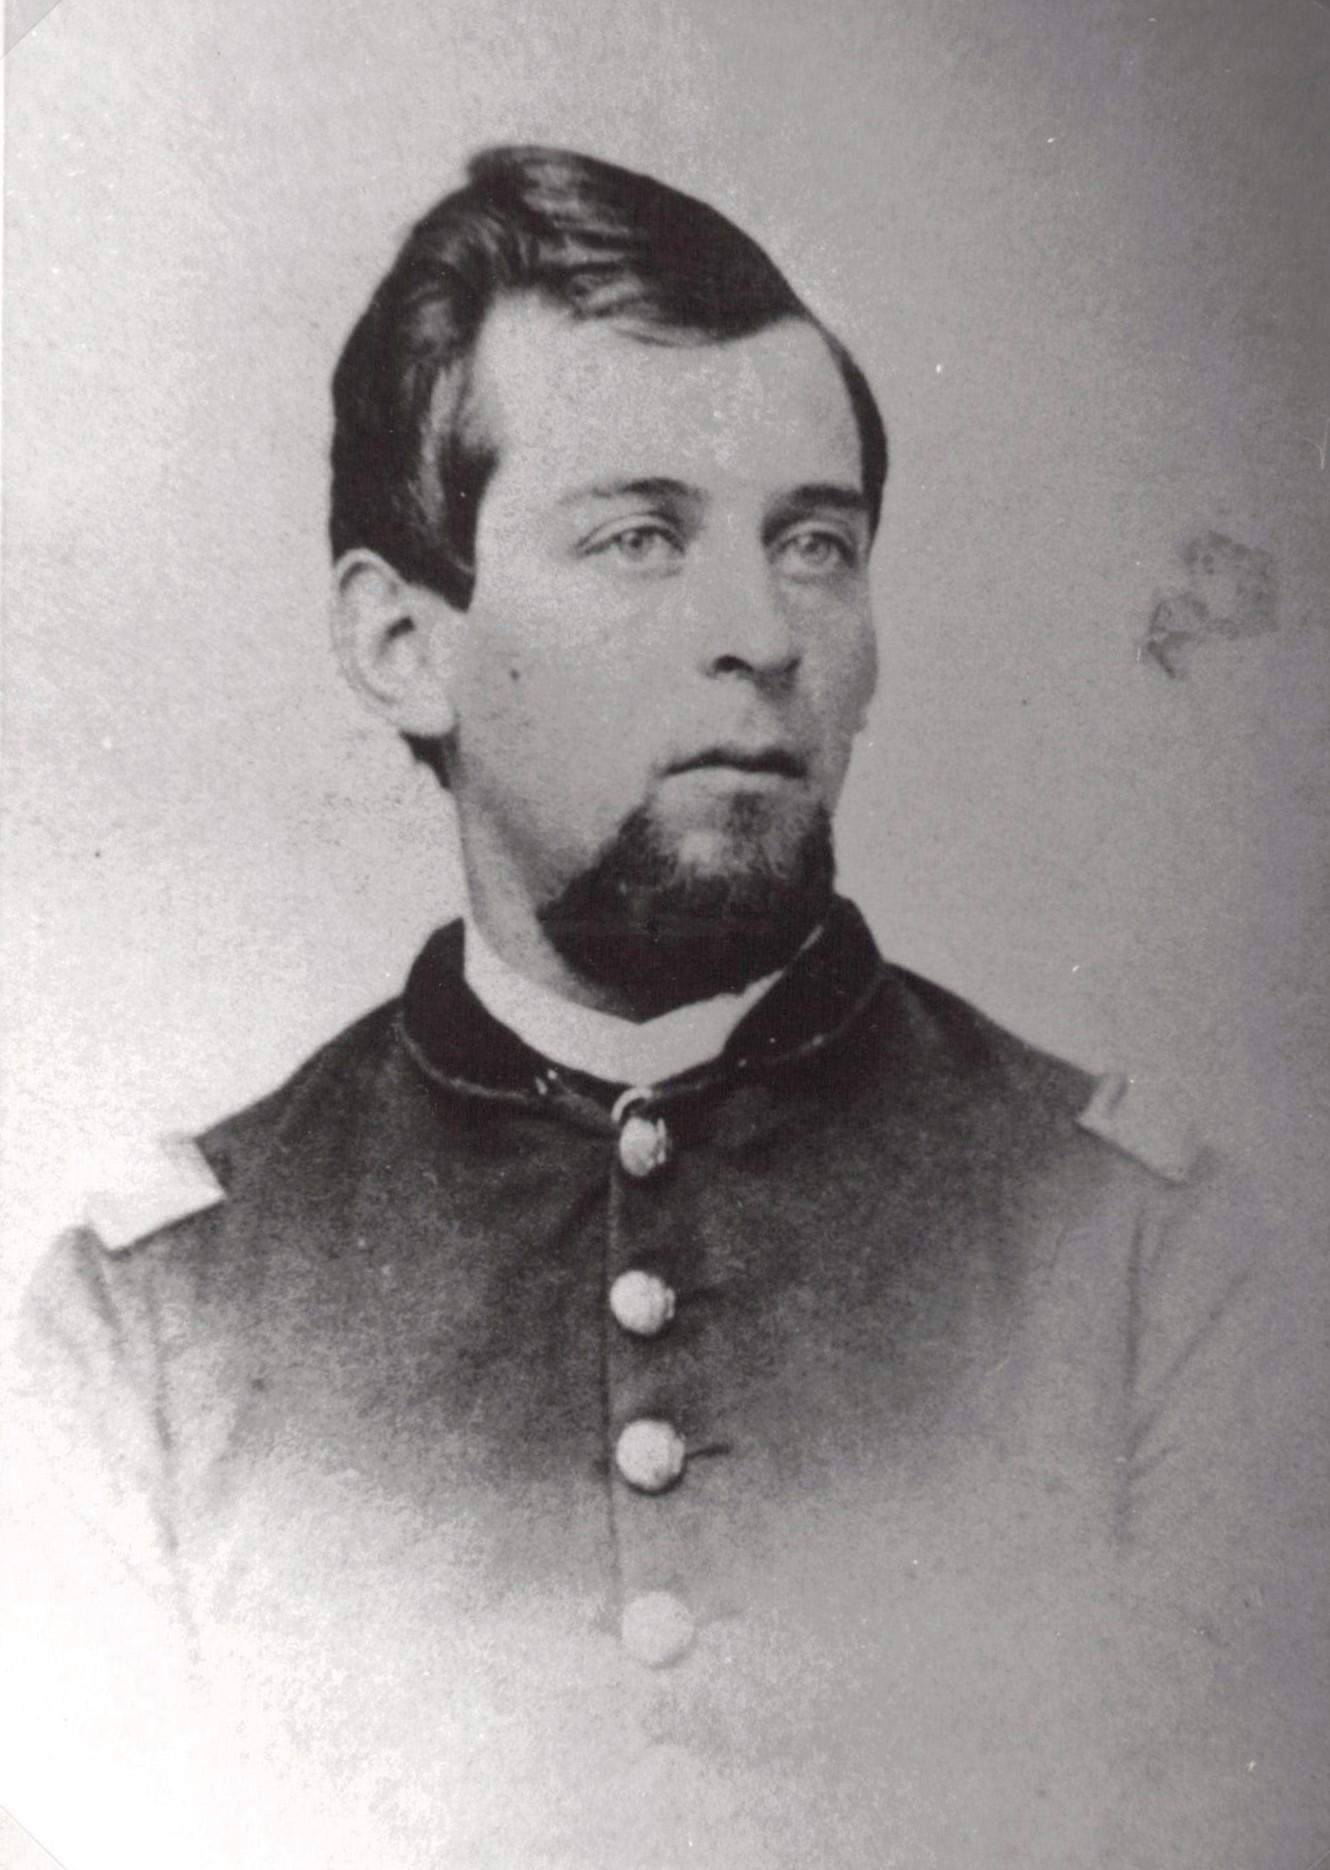 Lt. Samuel F. Edwards